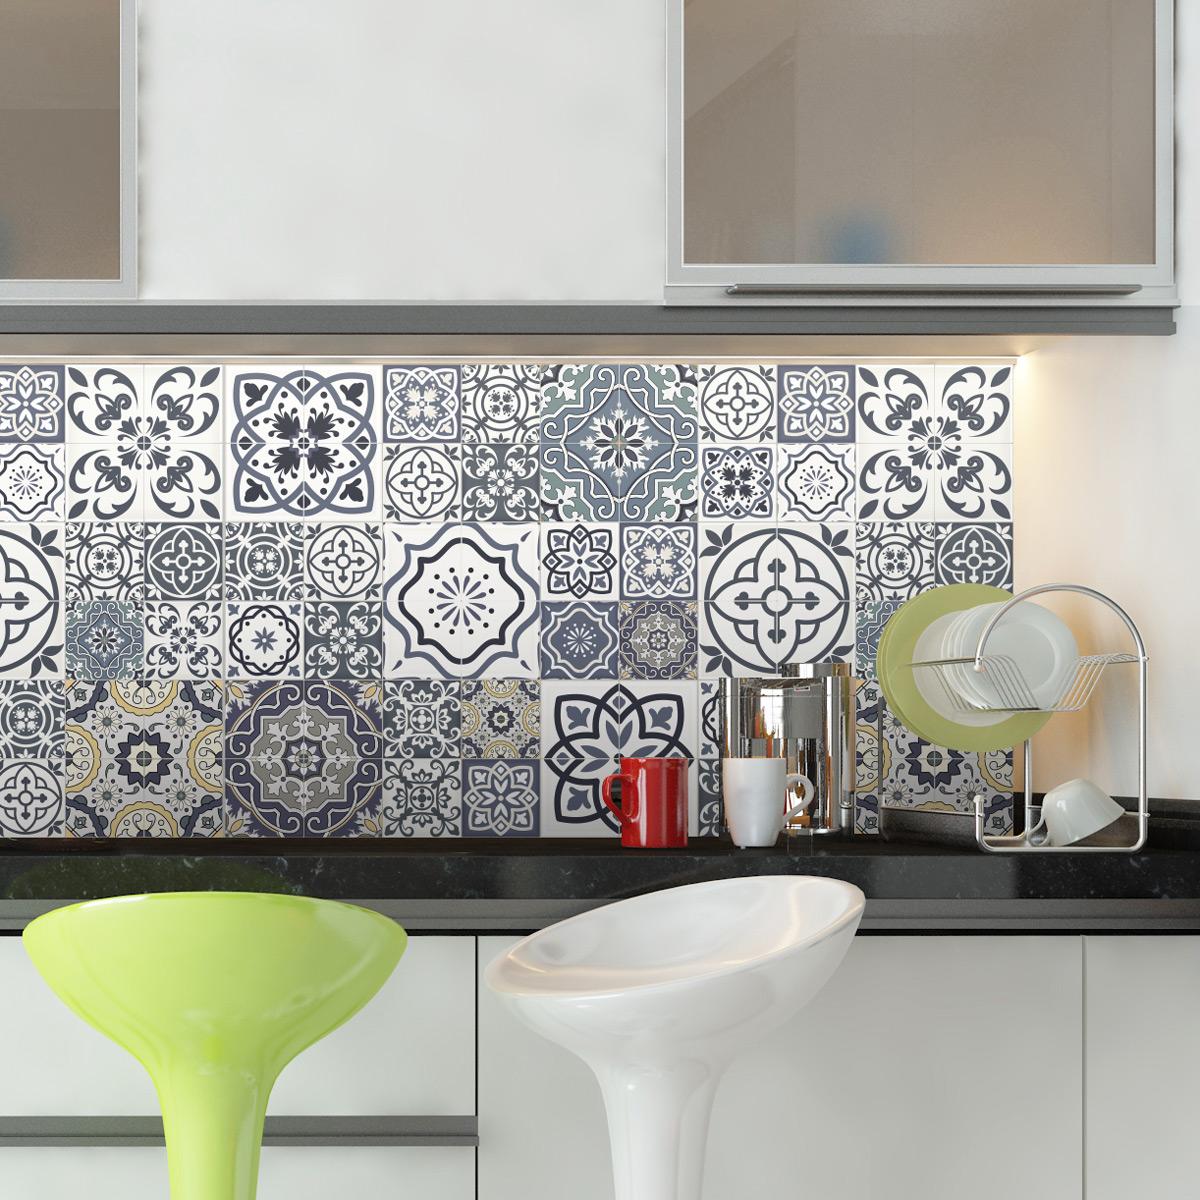 60 stickers carrelages azulejos milonga salle de bain et wc salle de bain ambiance sticker. Black Bedroom Furniture Sets. Home Design Ideas